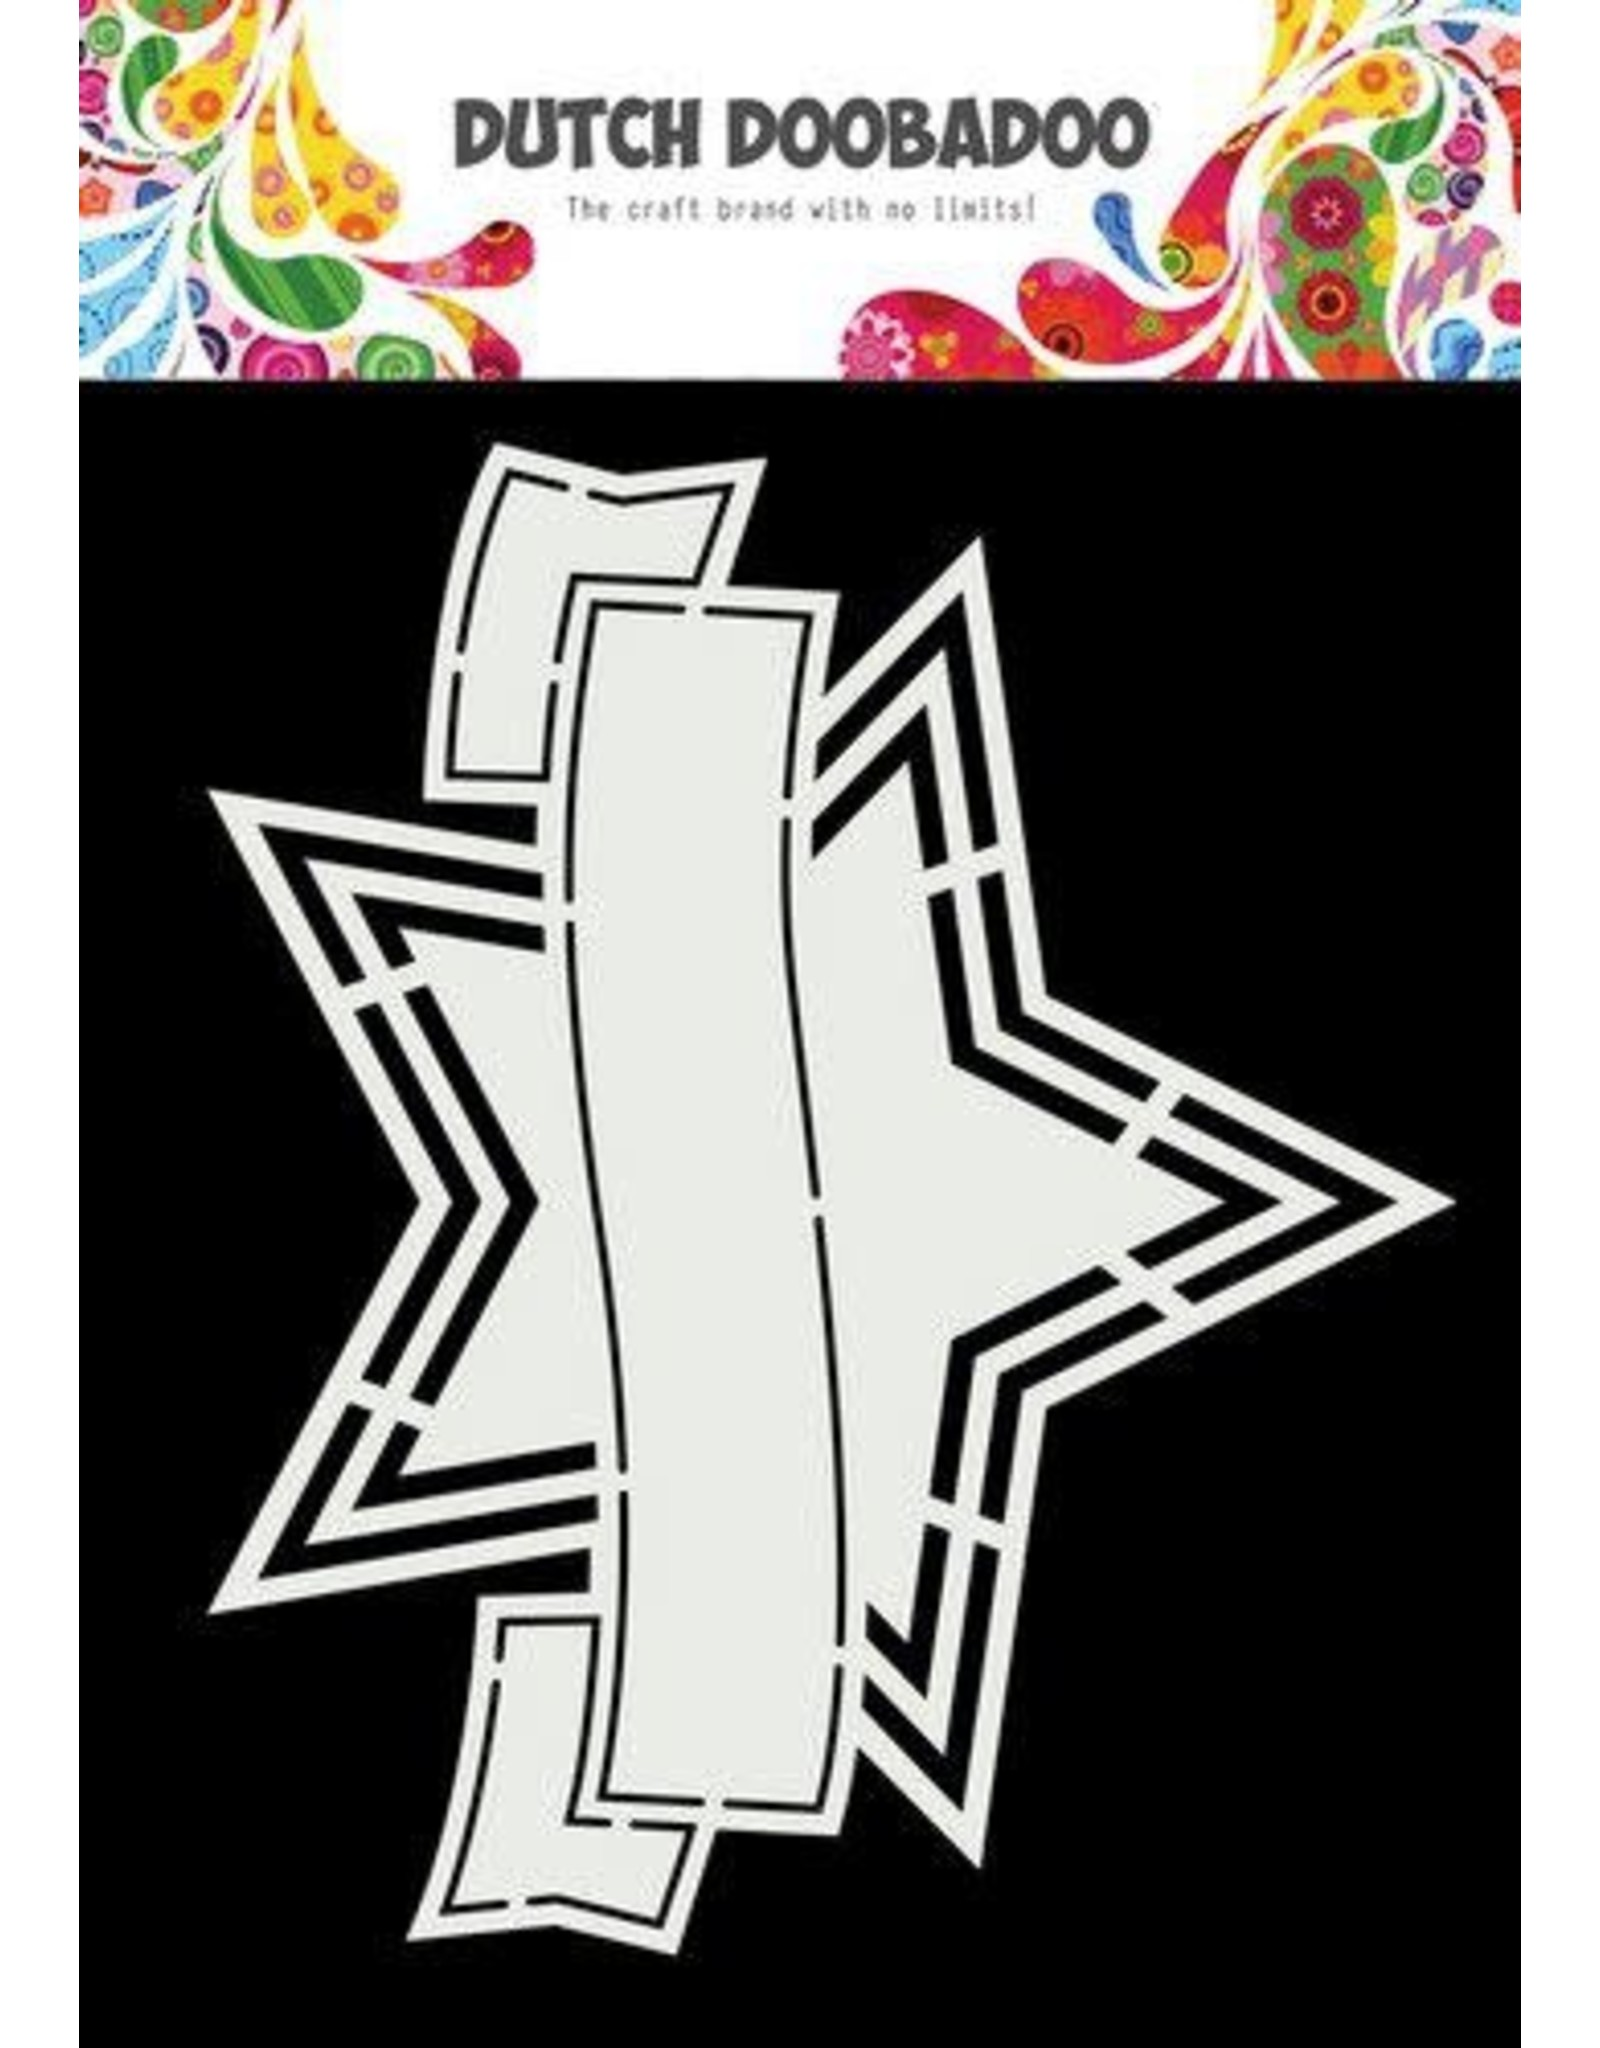 Dutch Doobadoo Dutch Doobadoo Shape Art Banner ster 470.784.041 175x145mm